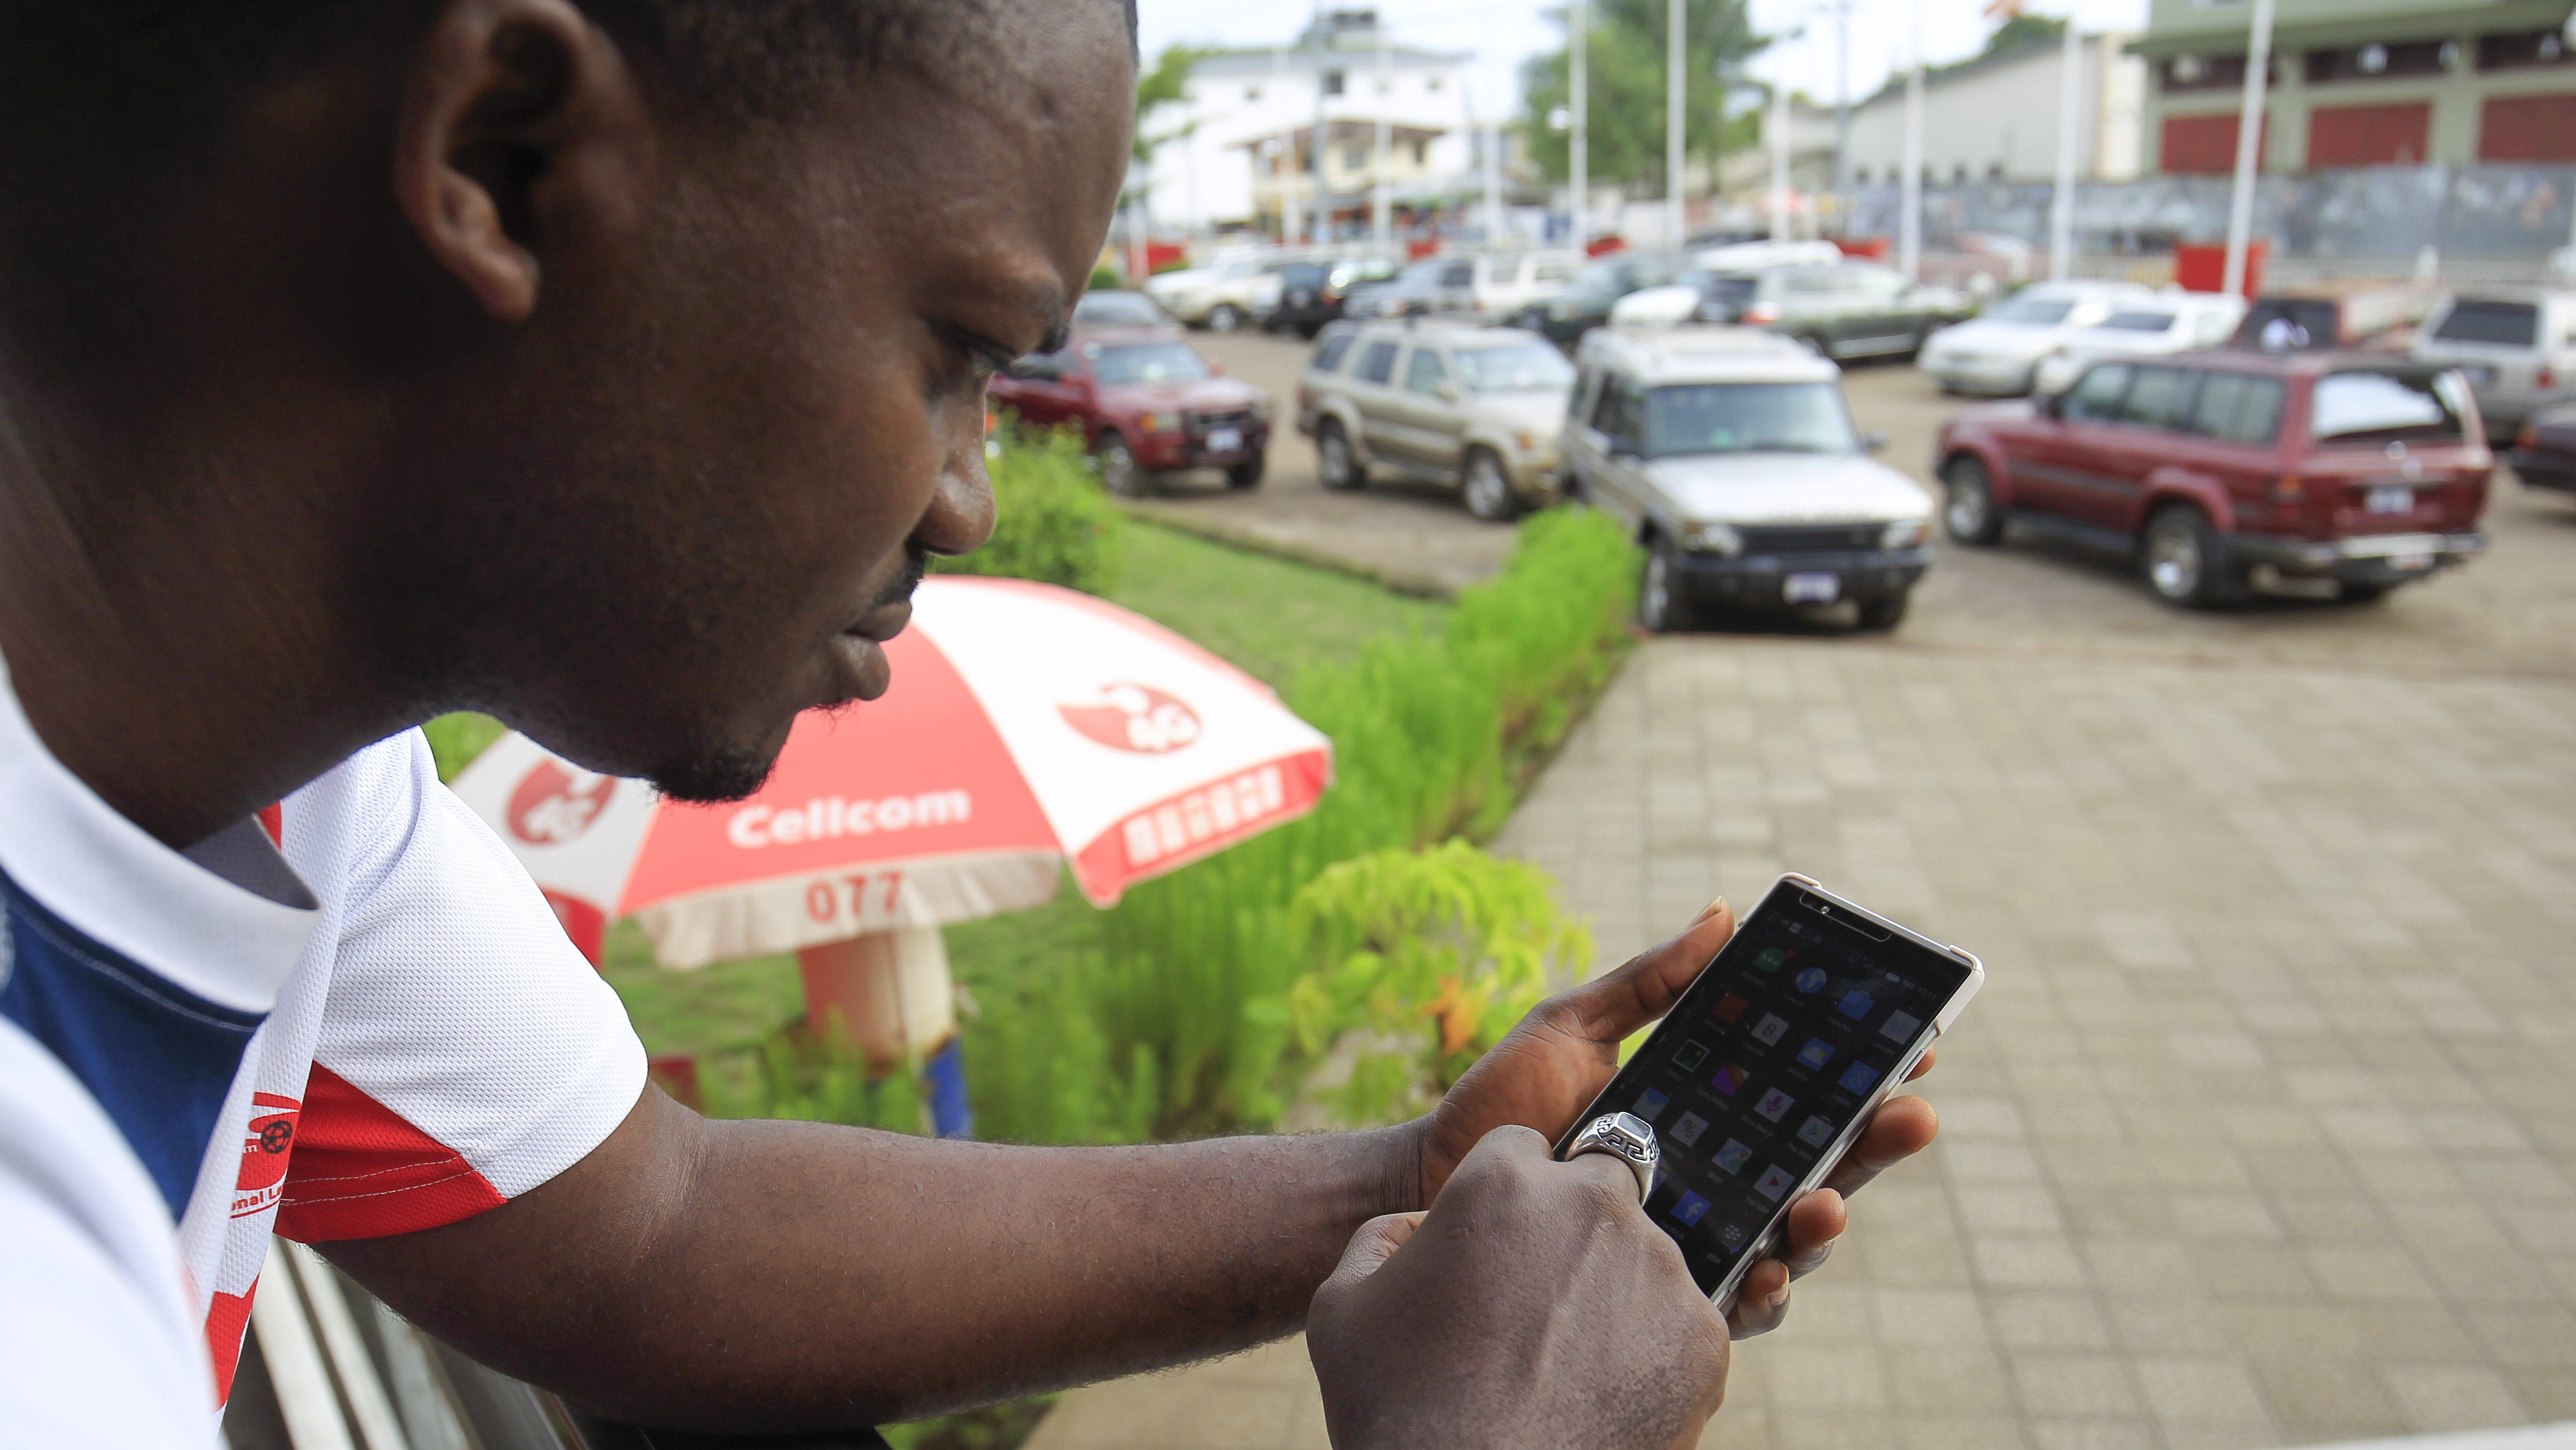 A man using a cellphone in Monrovia, Liberia 15 April 2016.